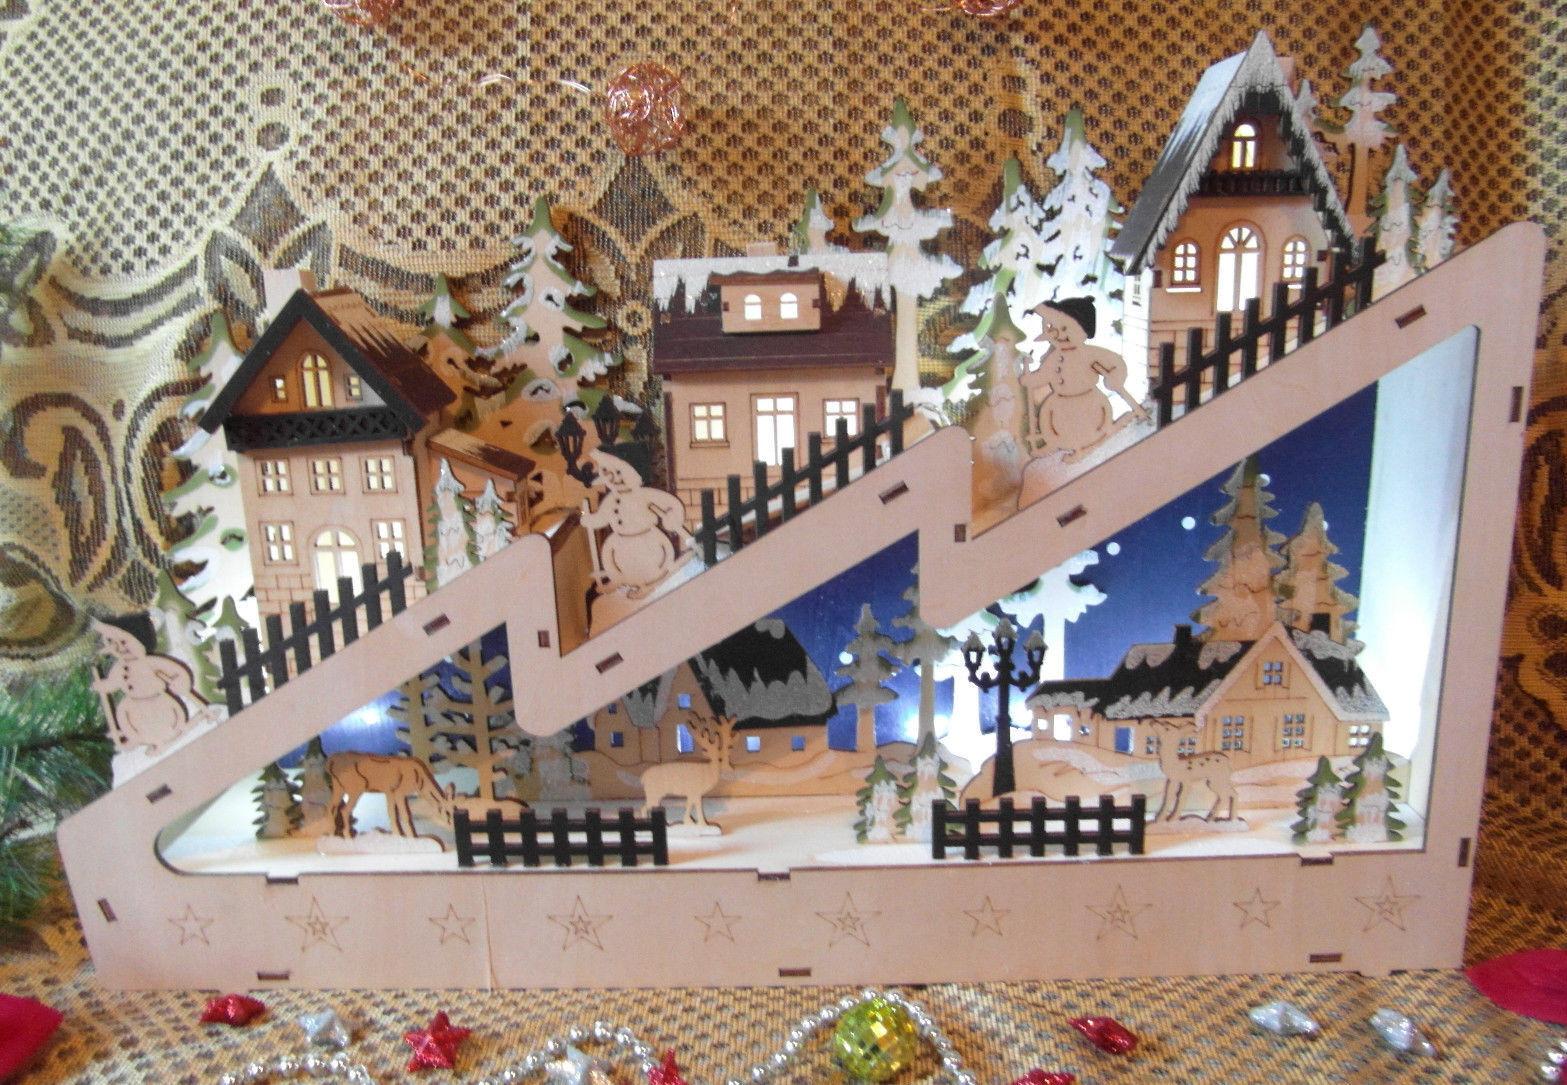 Weihnachtsdorf 3 D  Dorf Beleuchtung Holz  Figuren  Weihnachten LeuchteNEU A